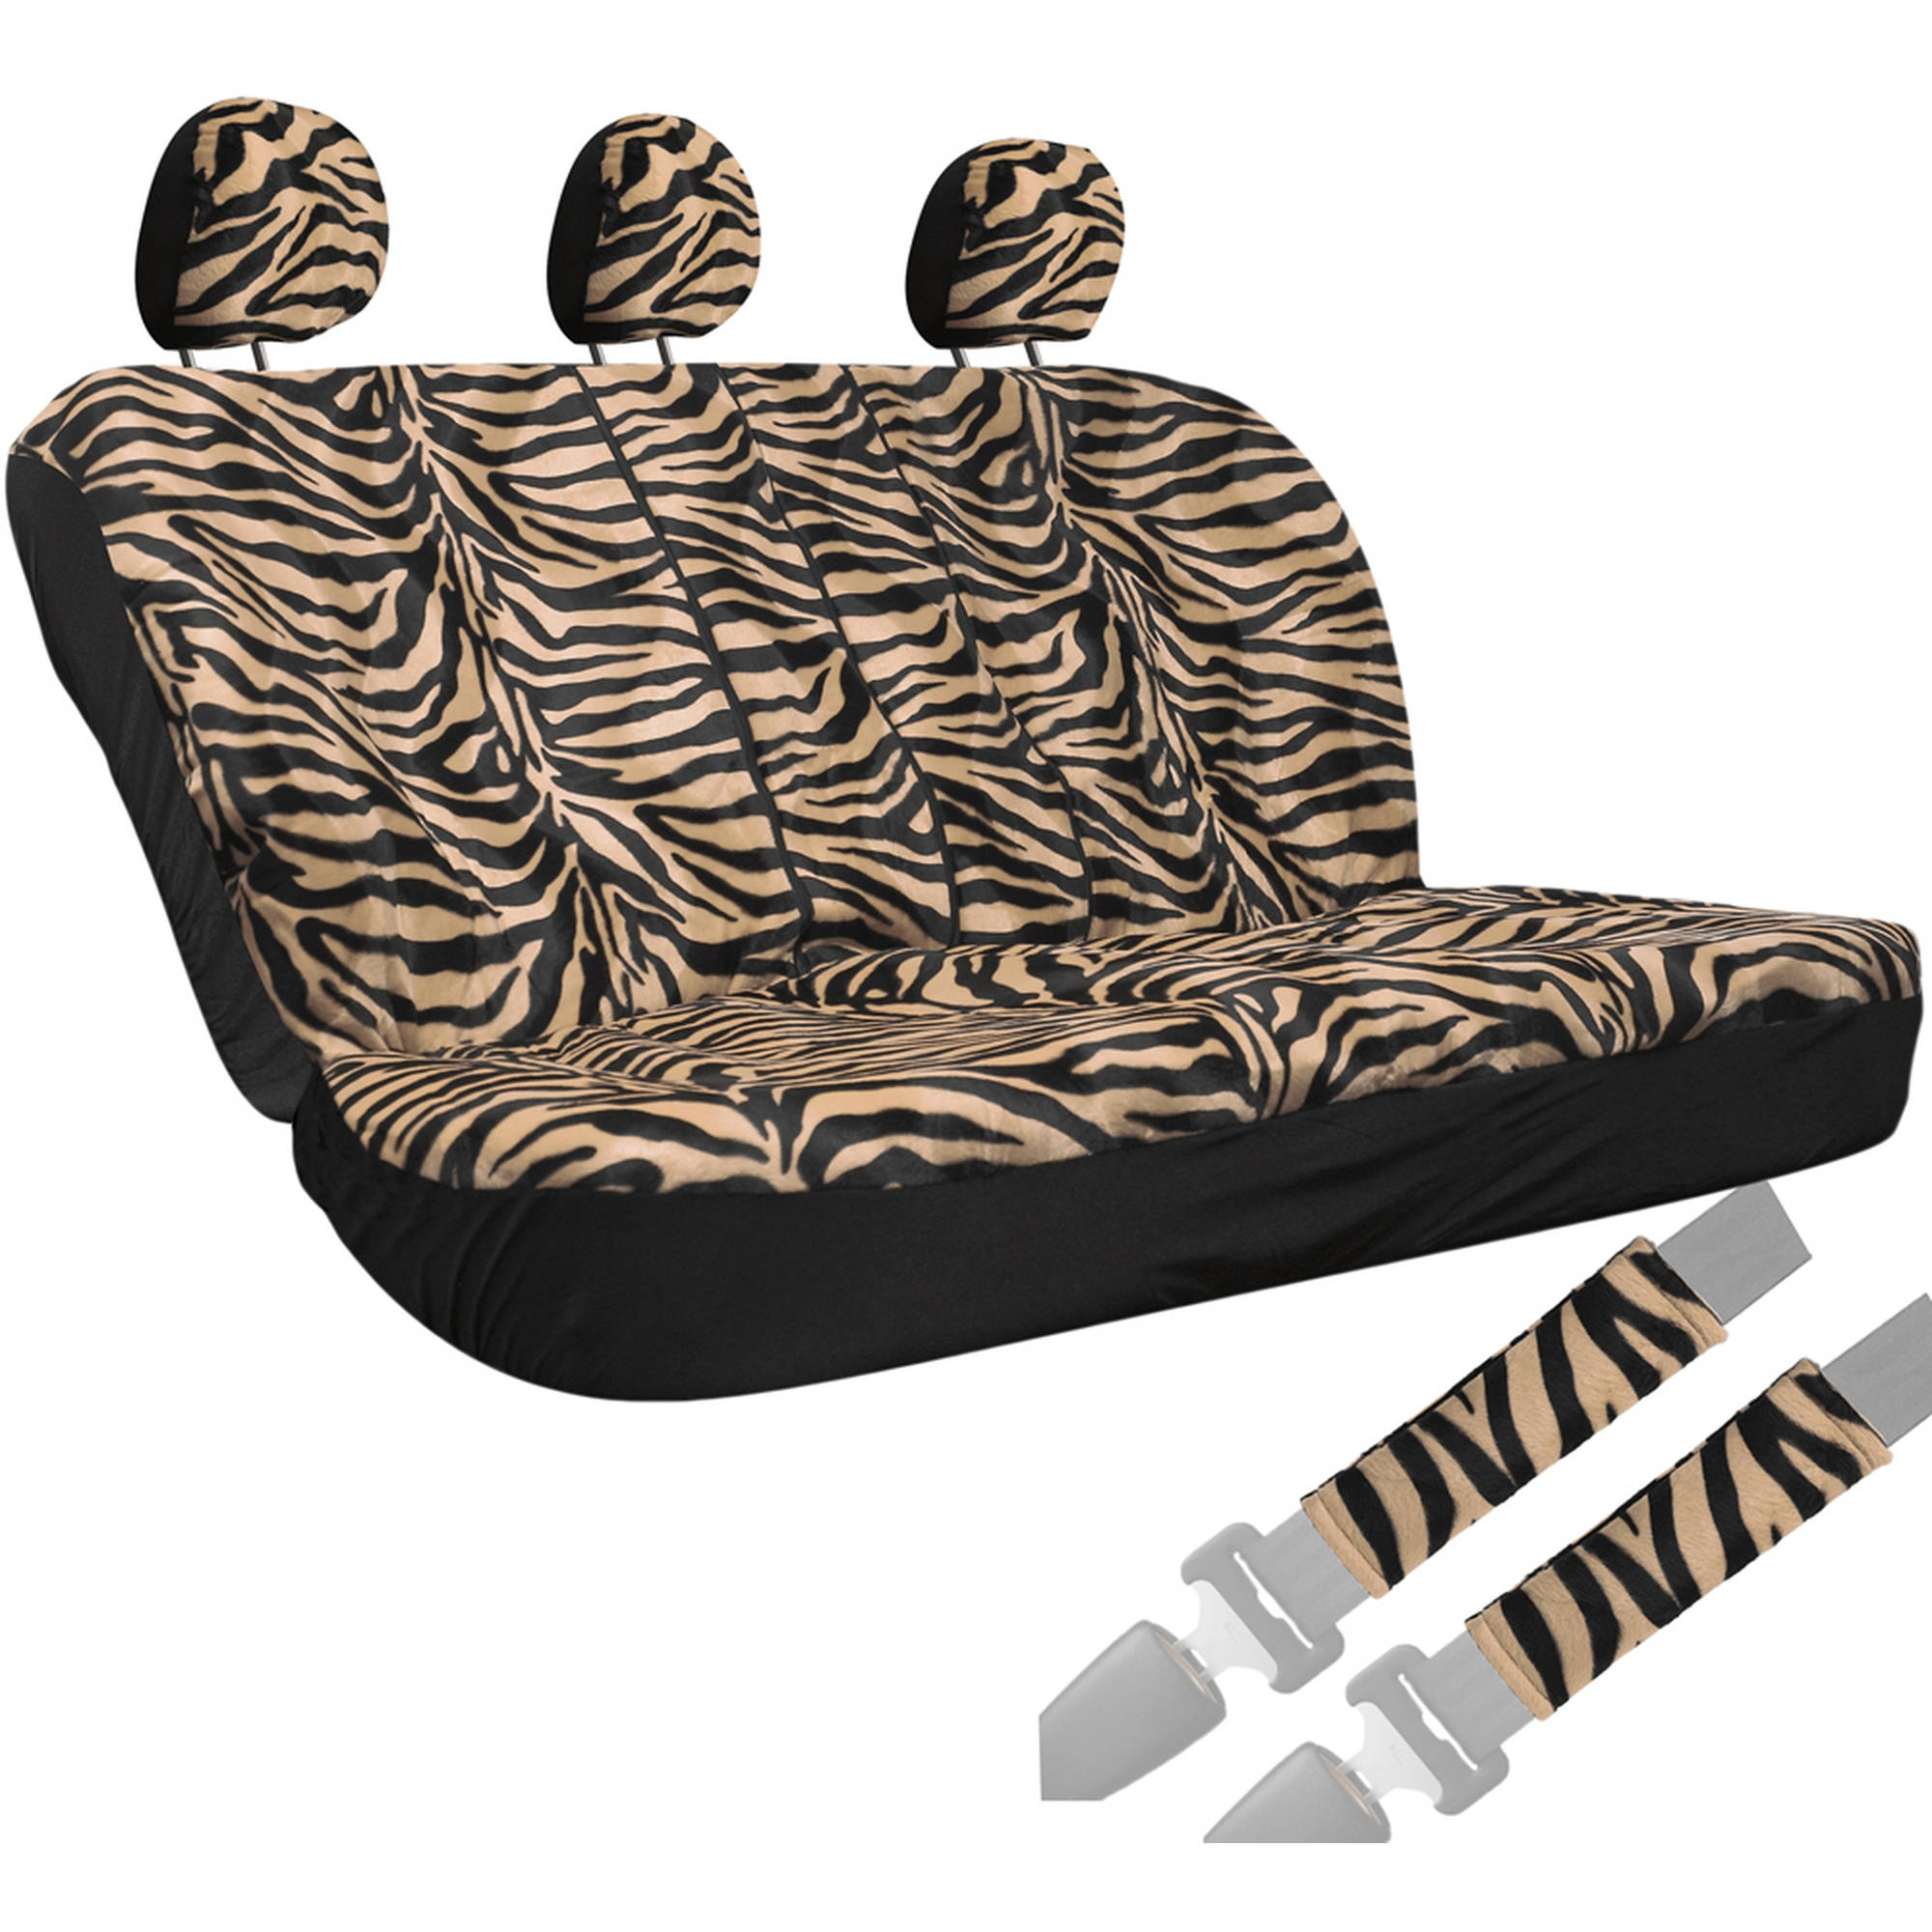 Oxgord 8-Piece Velour Zebra Striped Animal Print Low Back Rear Bench Car Seat Cover